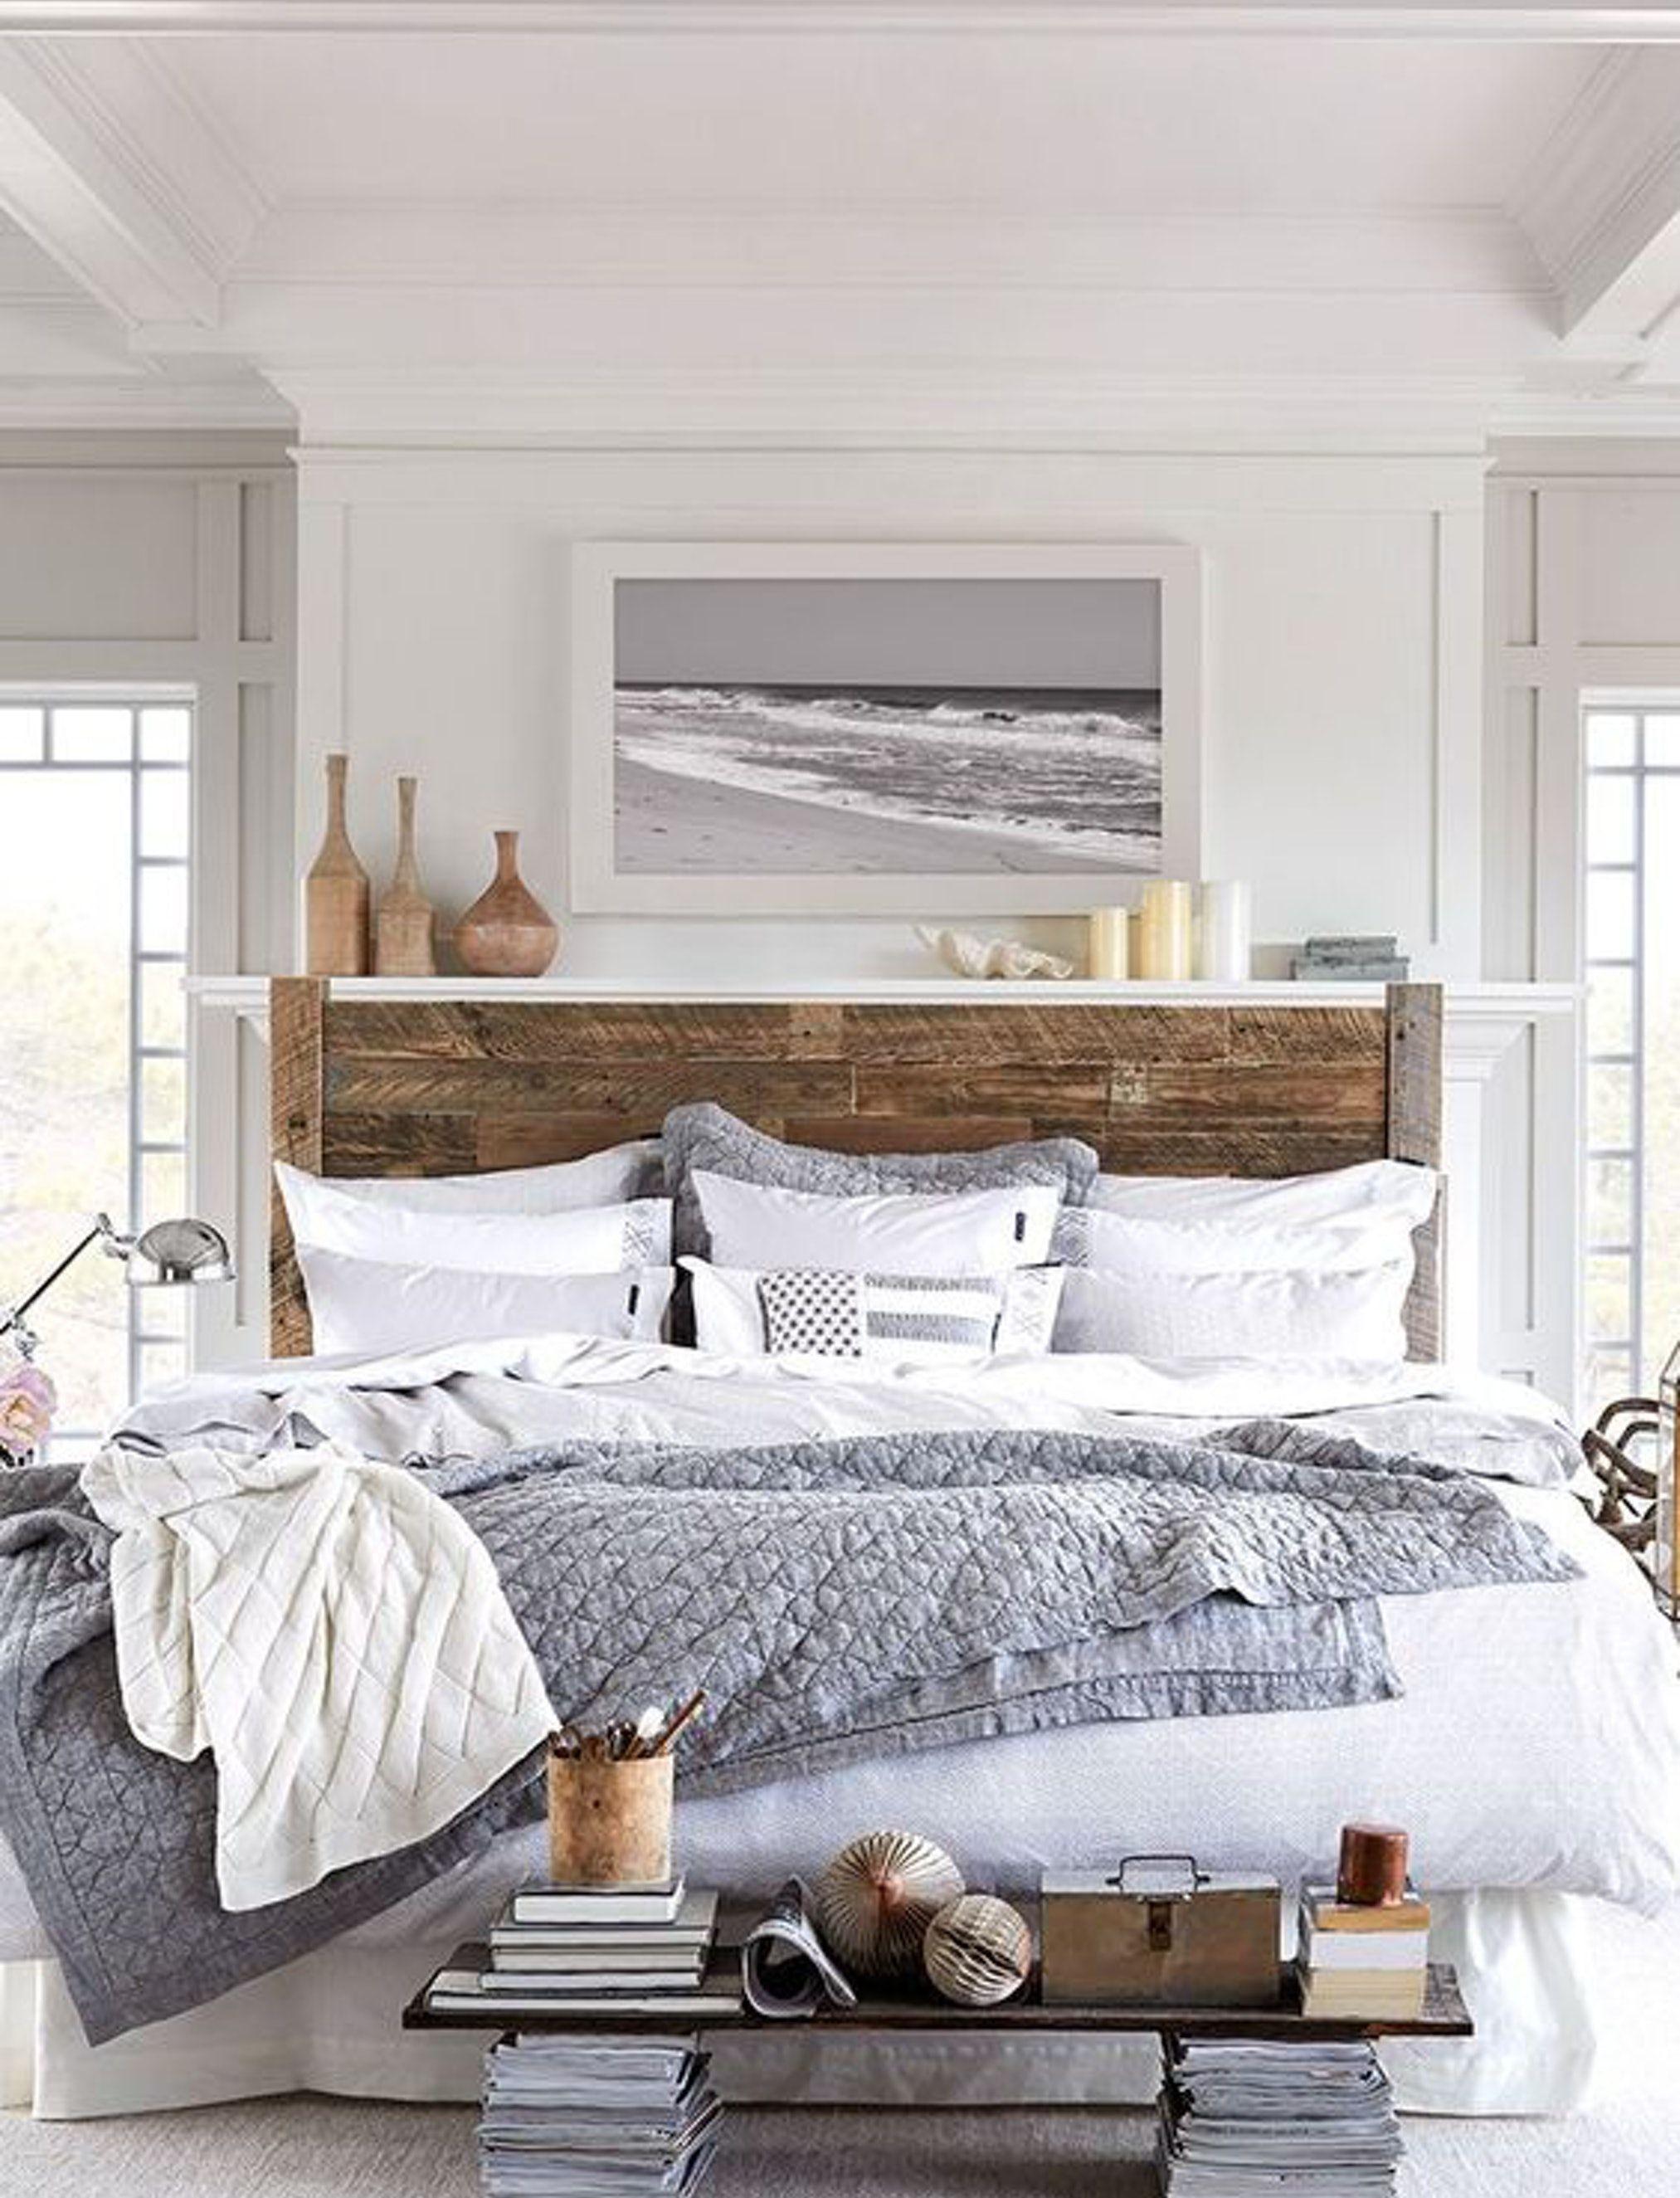 Interior Design Style Quiz Whatu0027s Your Decorating Style  98205113eb06a9f23f93cf3ced9f66b1 347480927490948924